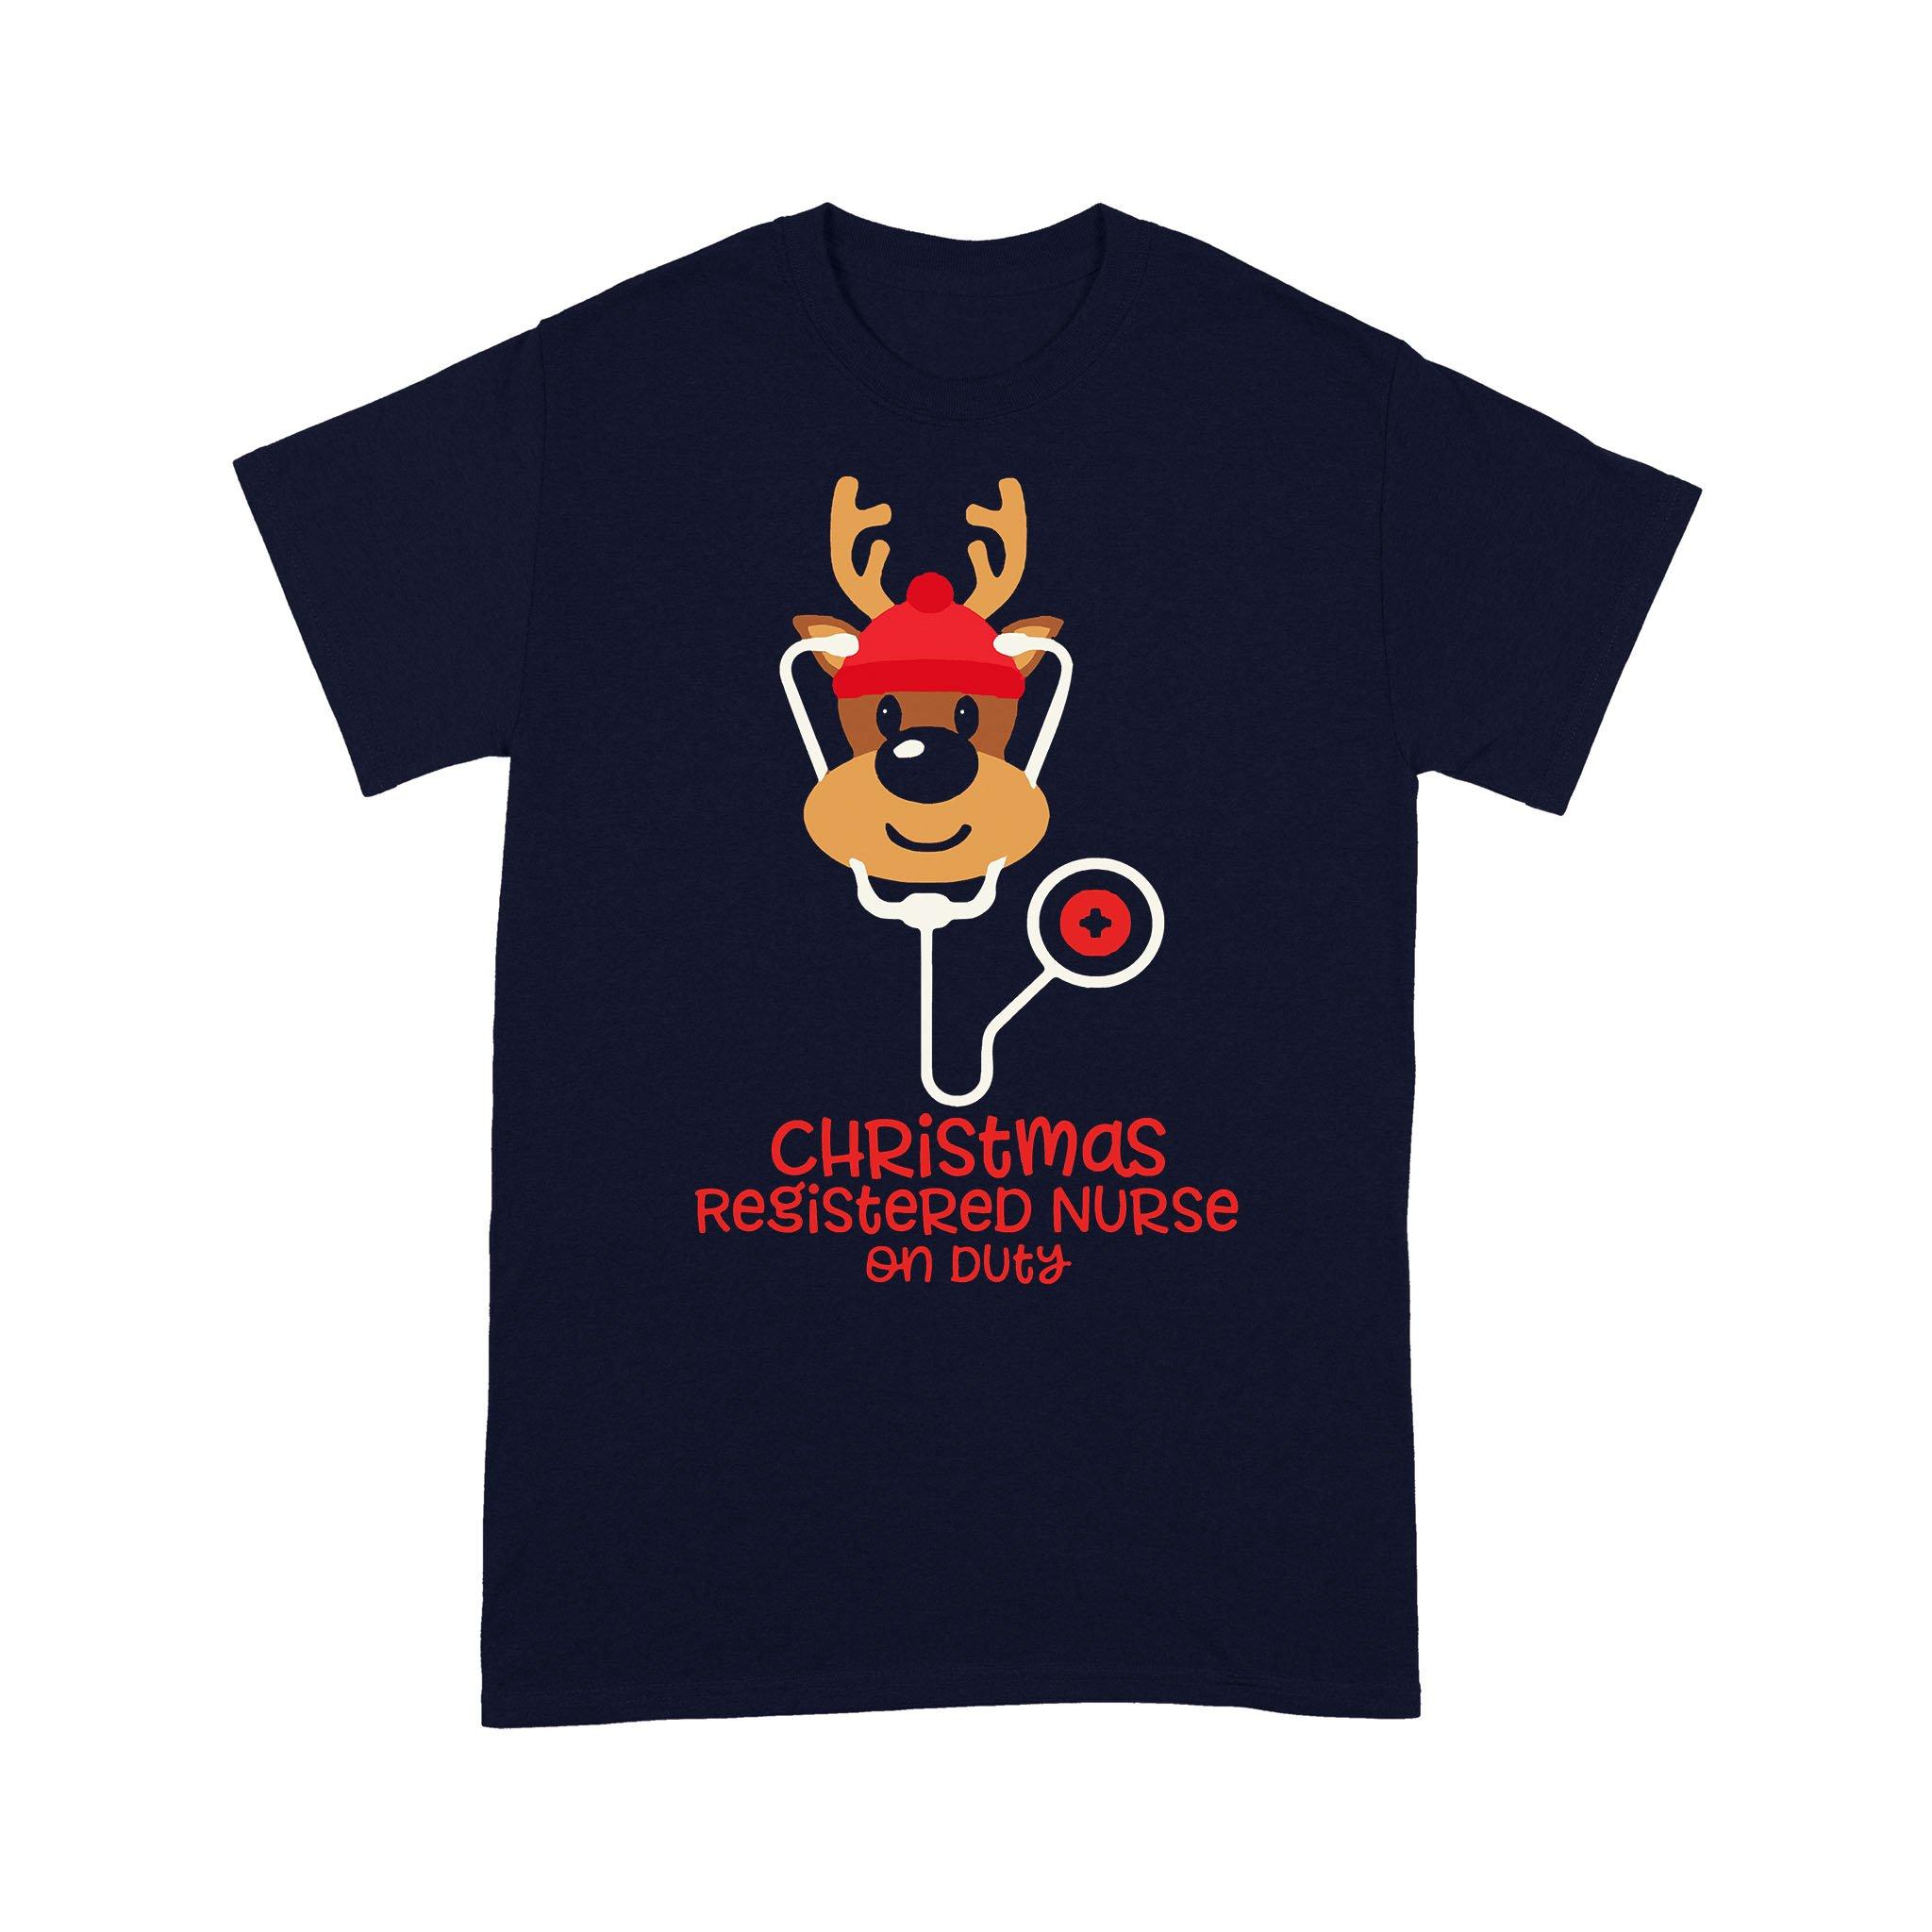 Christmas Registered Nurse Reindeer Nurse On Duty T-shirt